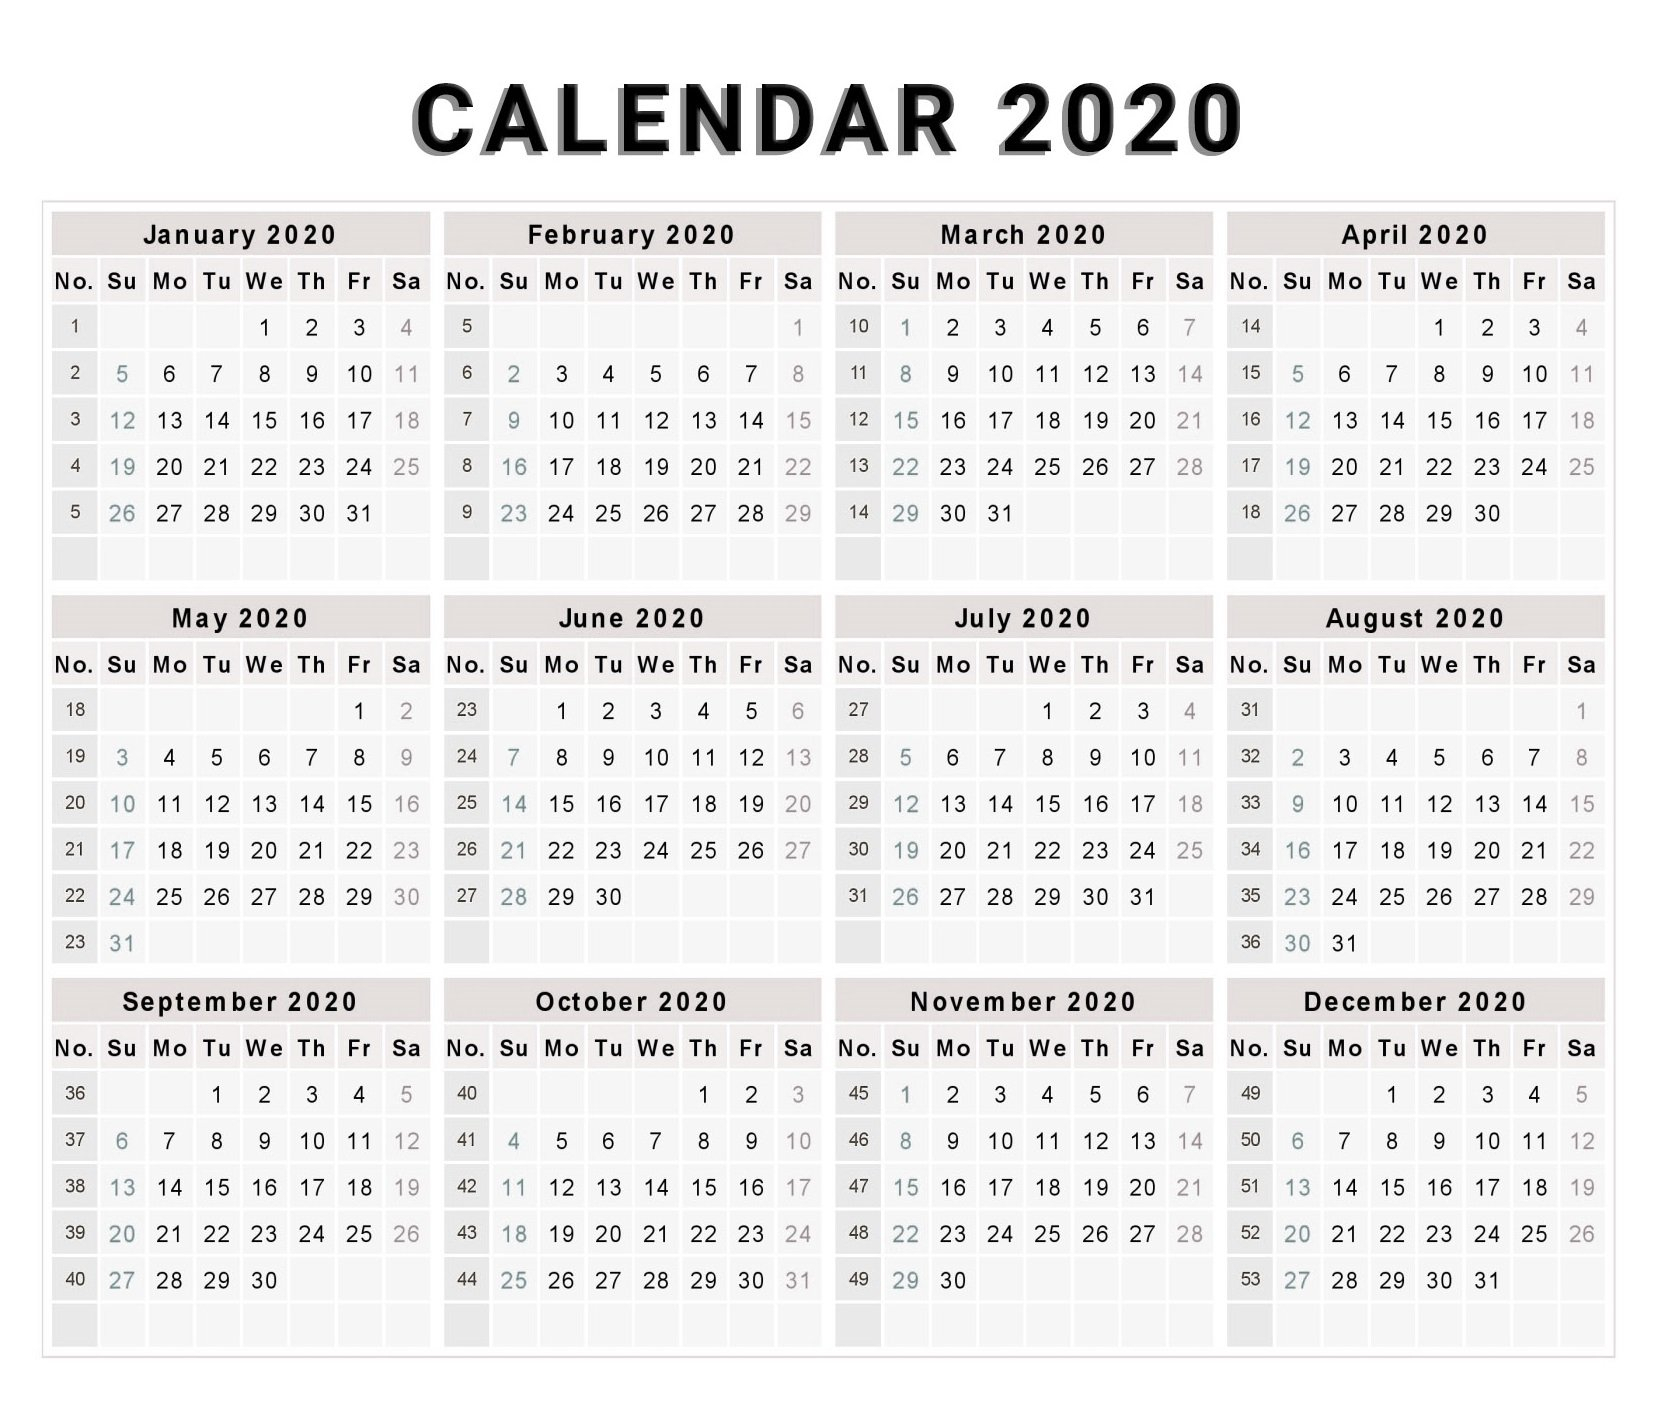 Blank 2020 One Page Calendar Printable - Free Printable Calendar